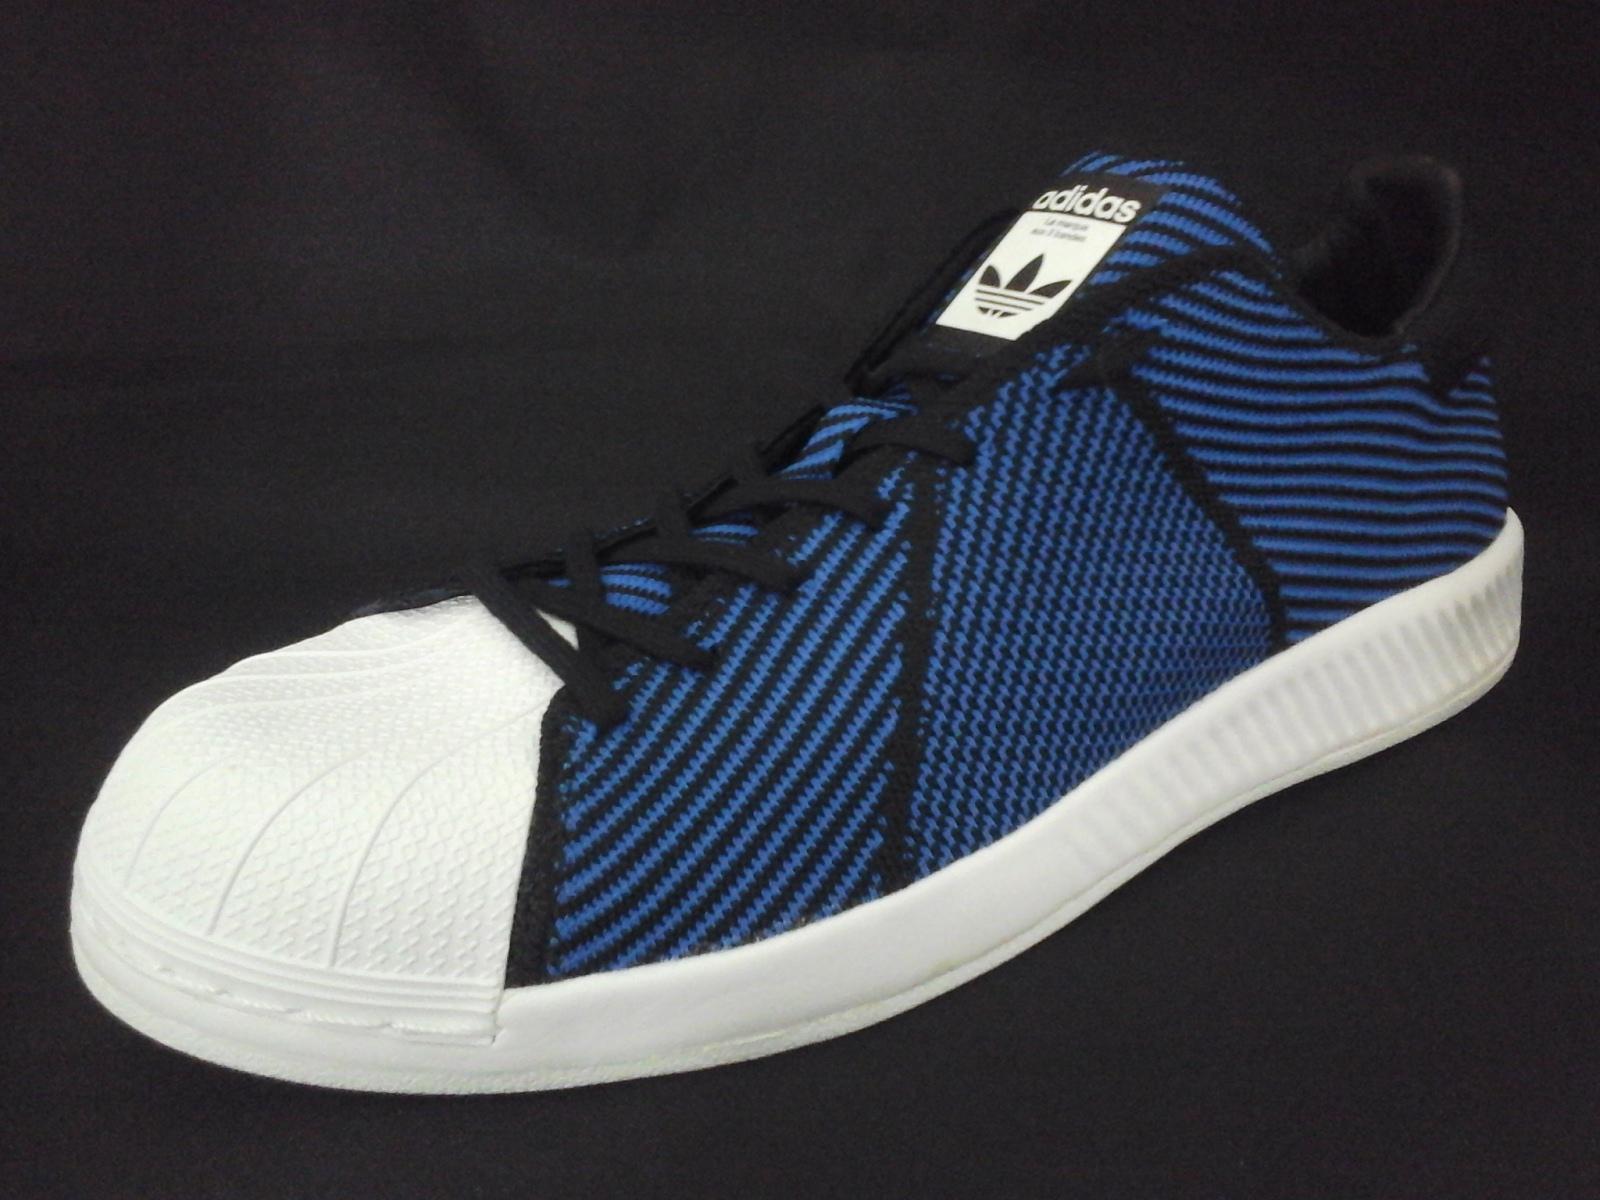 ADIDAS Superstar PK Bounce Shoes Sneakers Clamshell Blue S82242 US 12 EU 46  2 3 260da0013